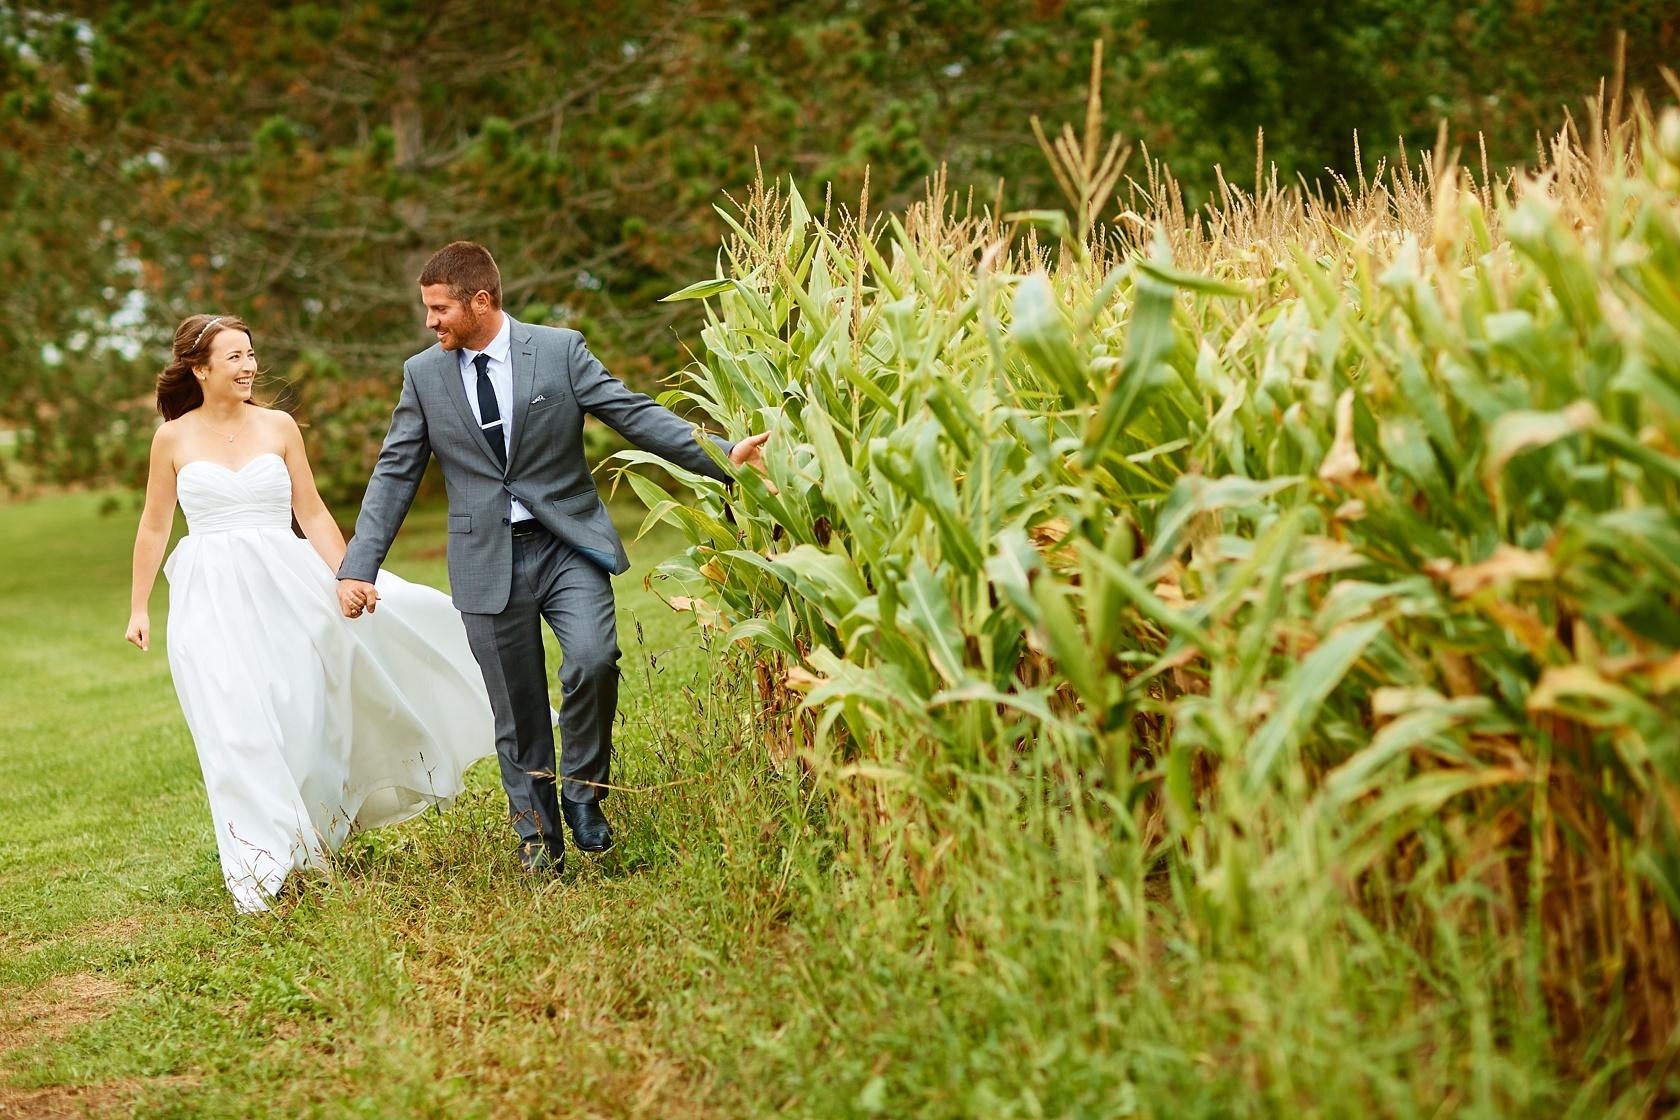 000010-farm-wedding-stephen-sager-photography